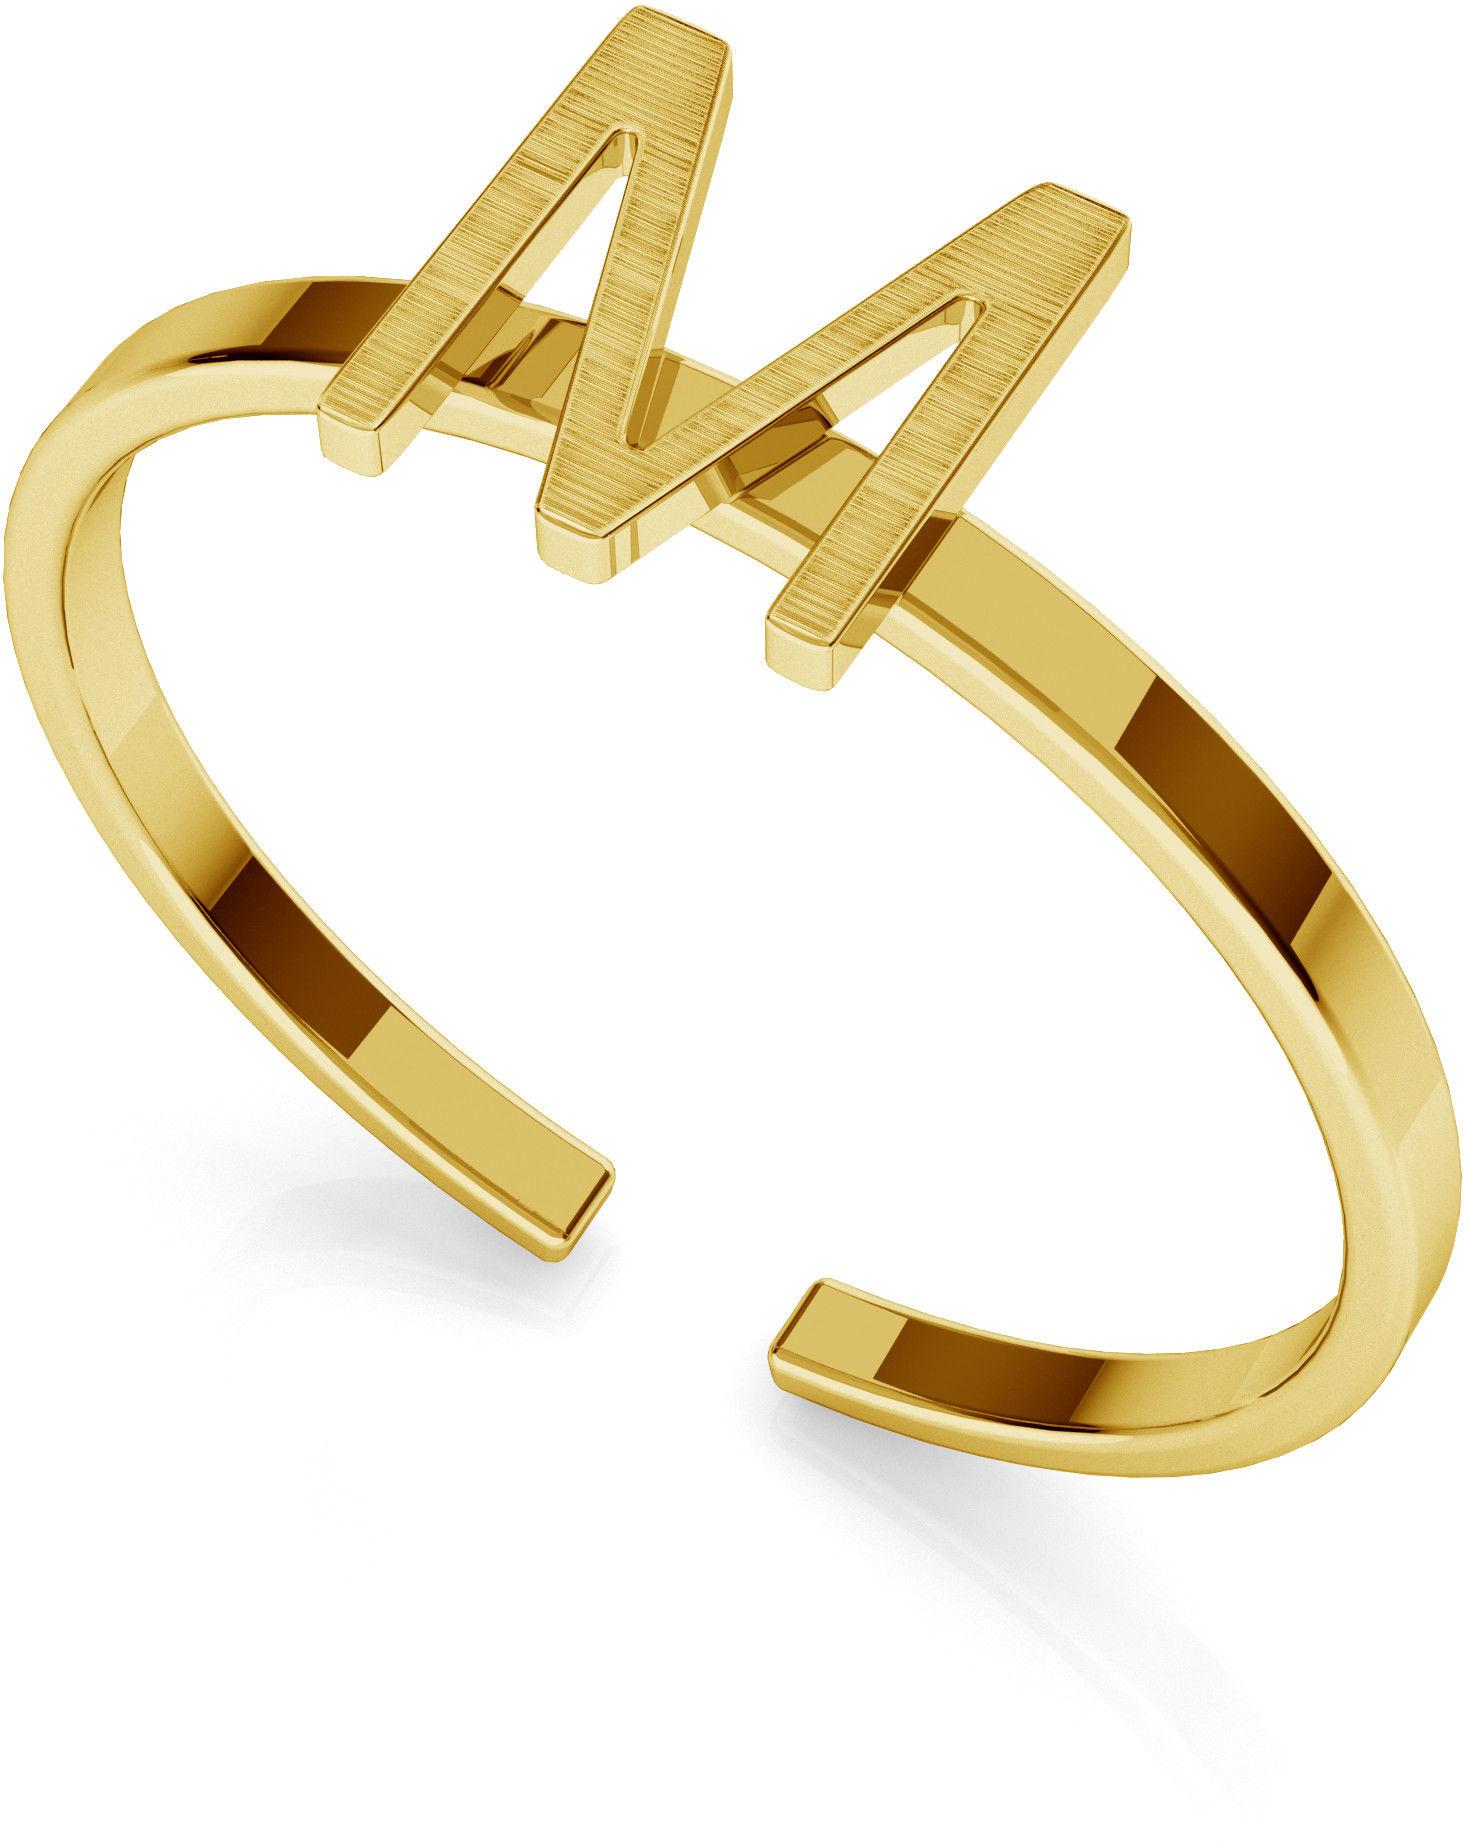 Srebrny pierścionek z literką My RING, srebro 925 : Litera - D, Srebro - kolor pokrycia - Pokrycie żółtym 18K złotem